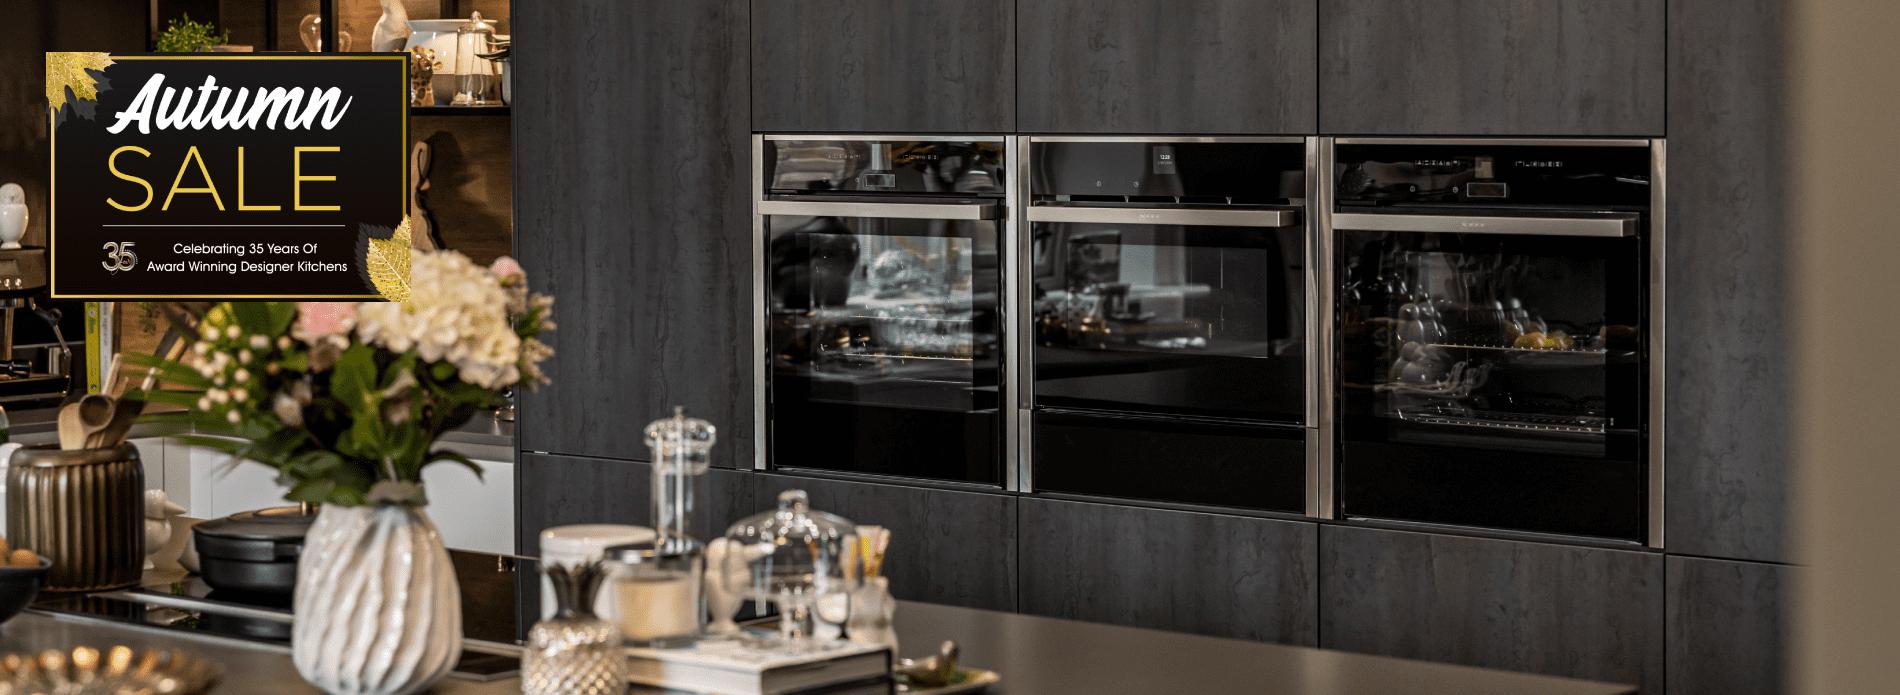 Cashback On High-tech Neff Appliances